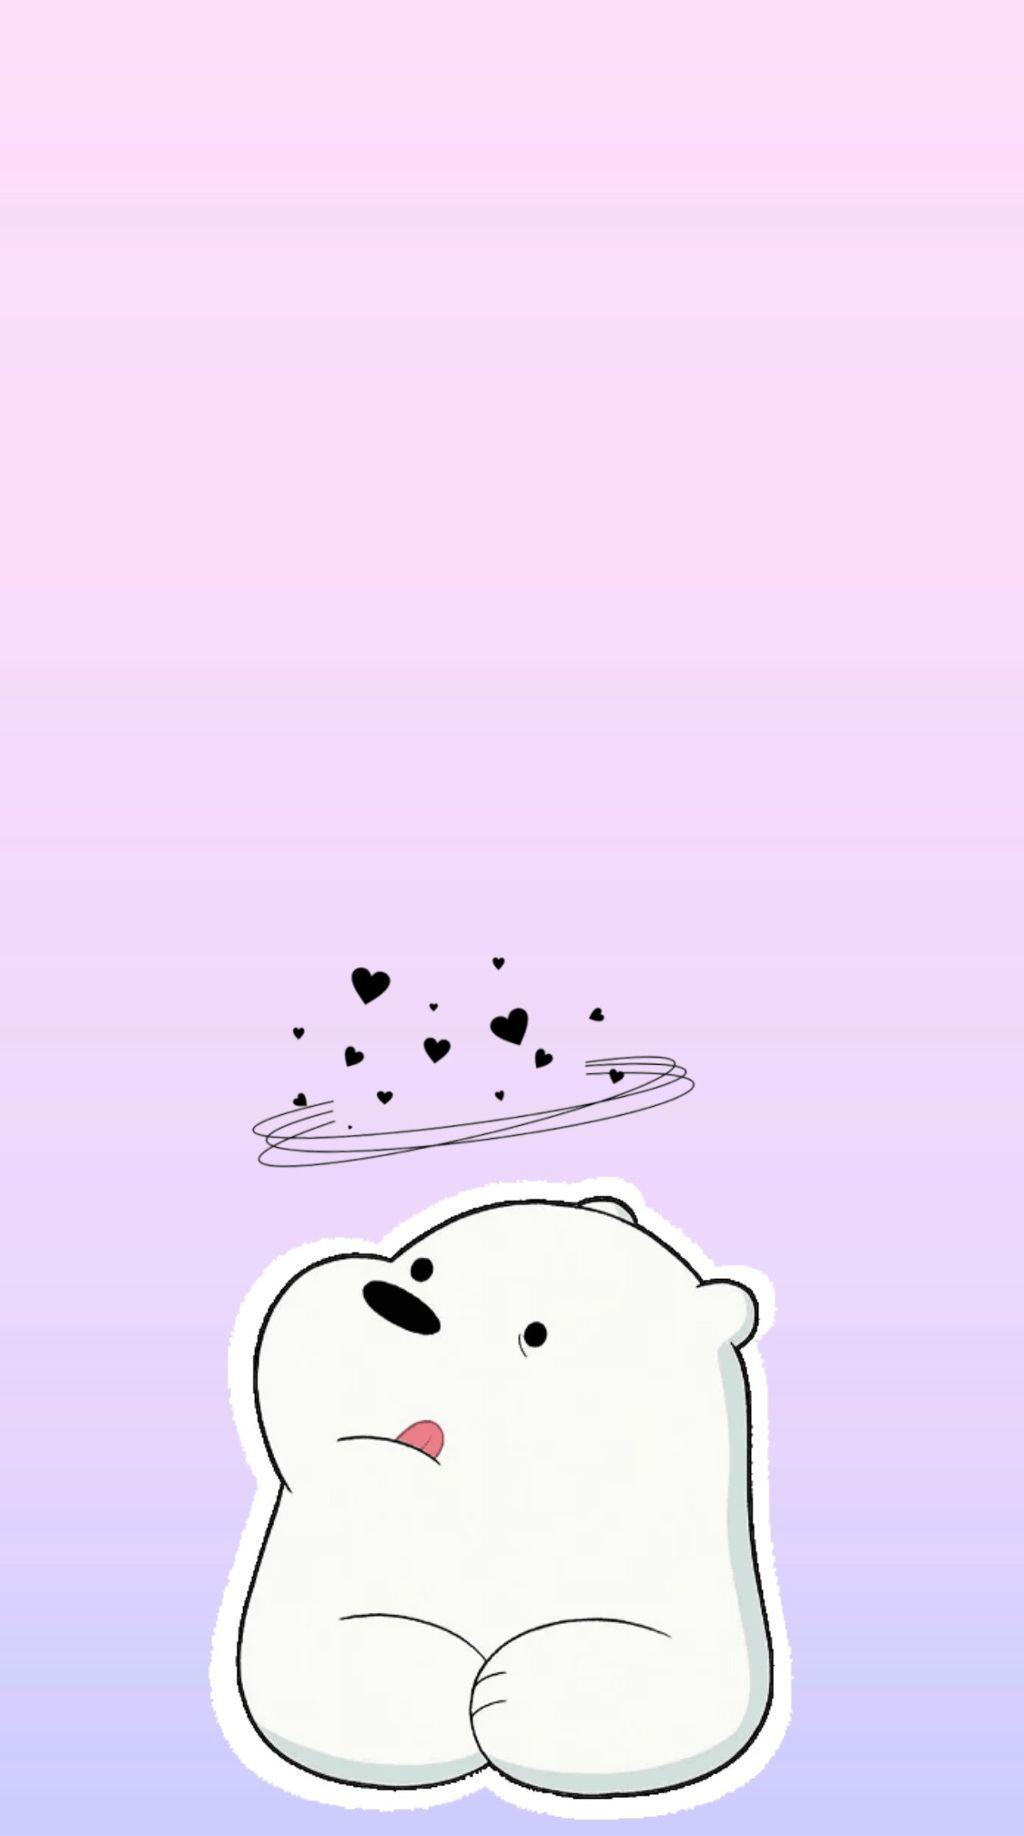 We Bare Bears Ice Bear Iphone Wallpaper Webearbear Bear Wallpaper We Bare Bears Wallpapers Cute Panda Wallpaper